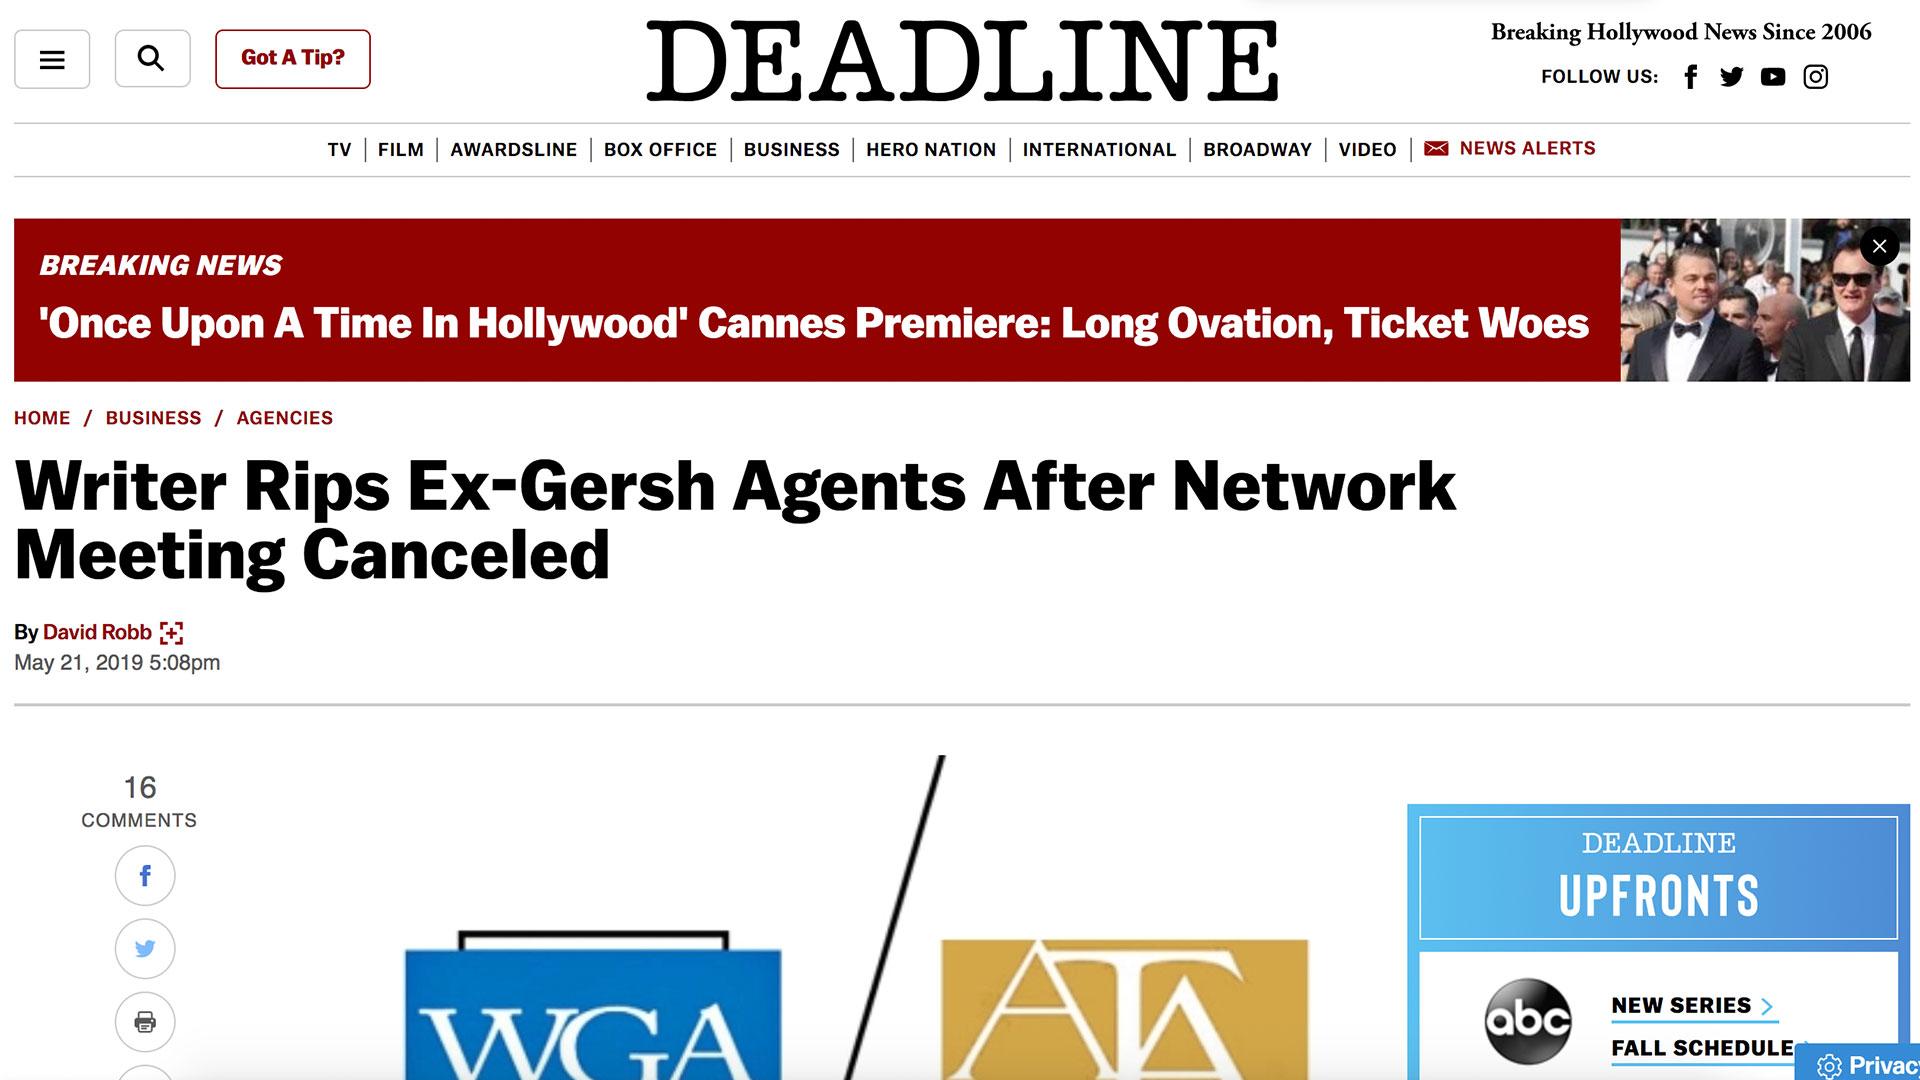 Fairness Rocks News Writer Rips Ex-Gersh Agents After Network Meeting Canceled